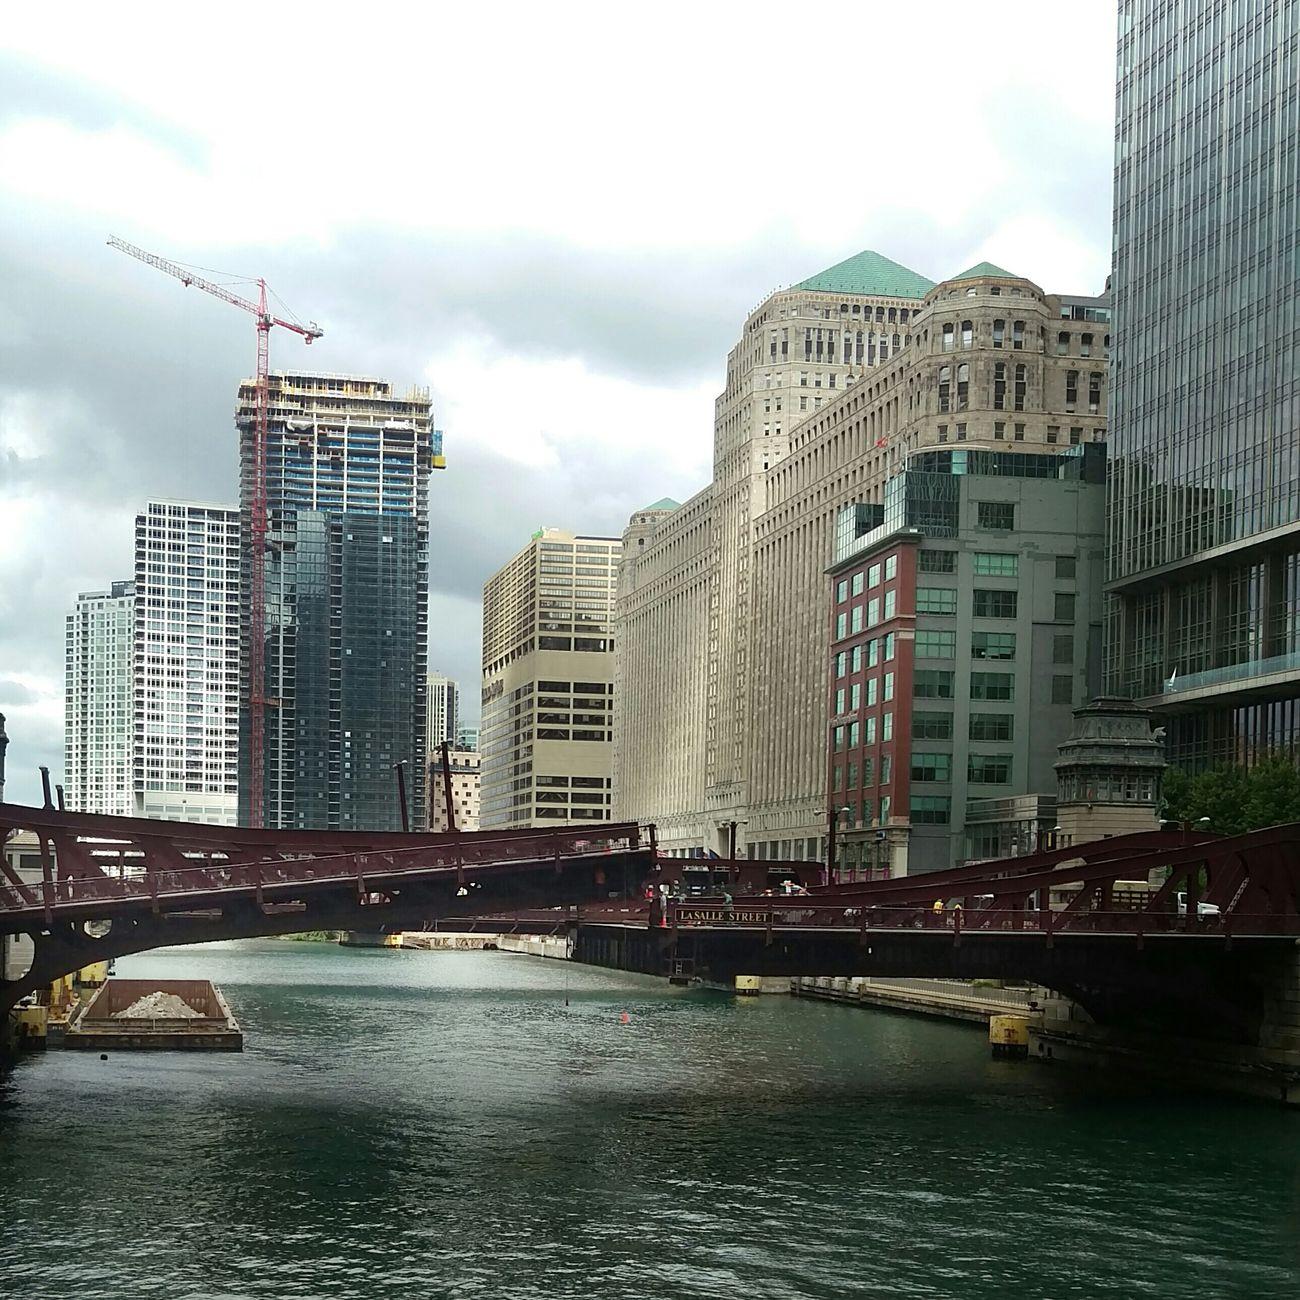 Cranes, trains, and funky sun rays EyeEm Best Edits Architecture Bridges River Construction